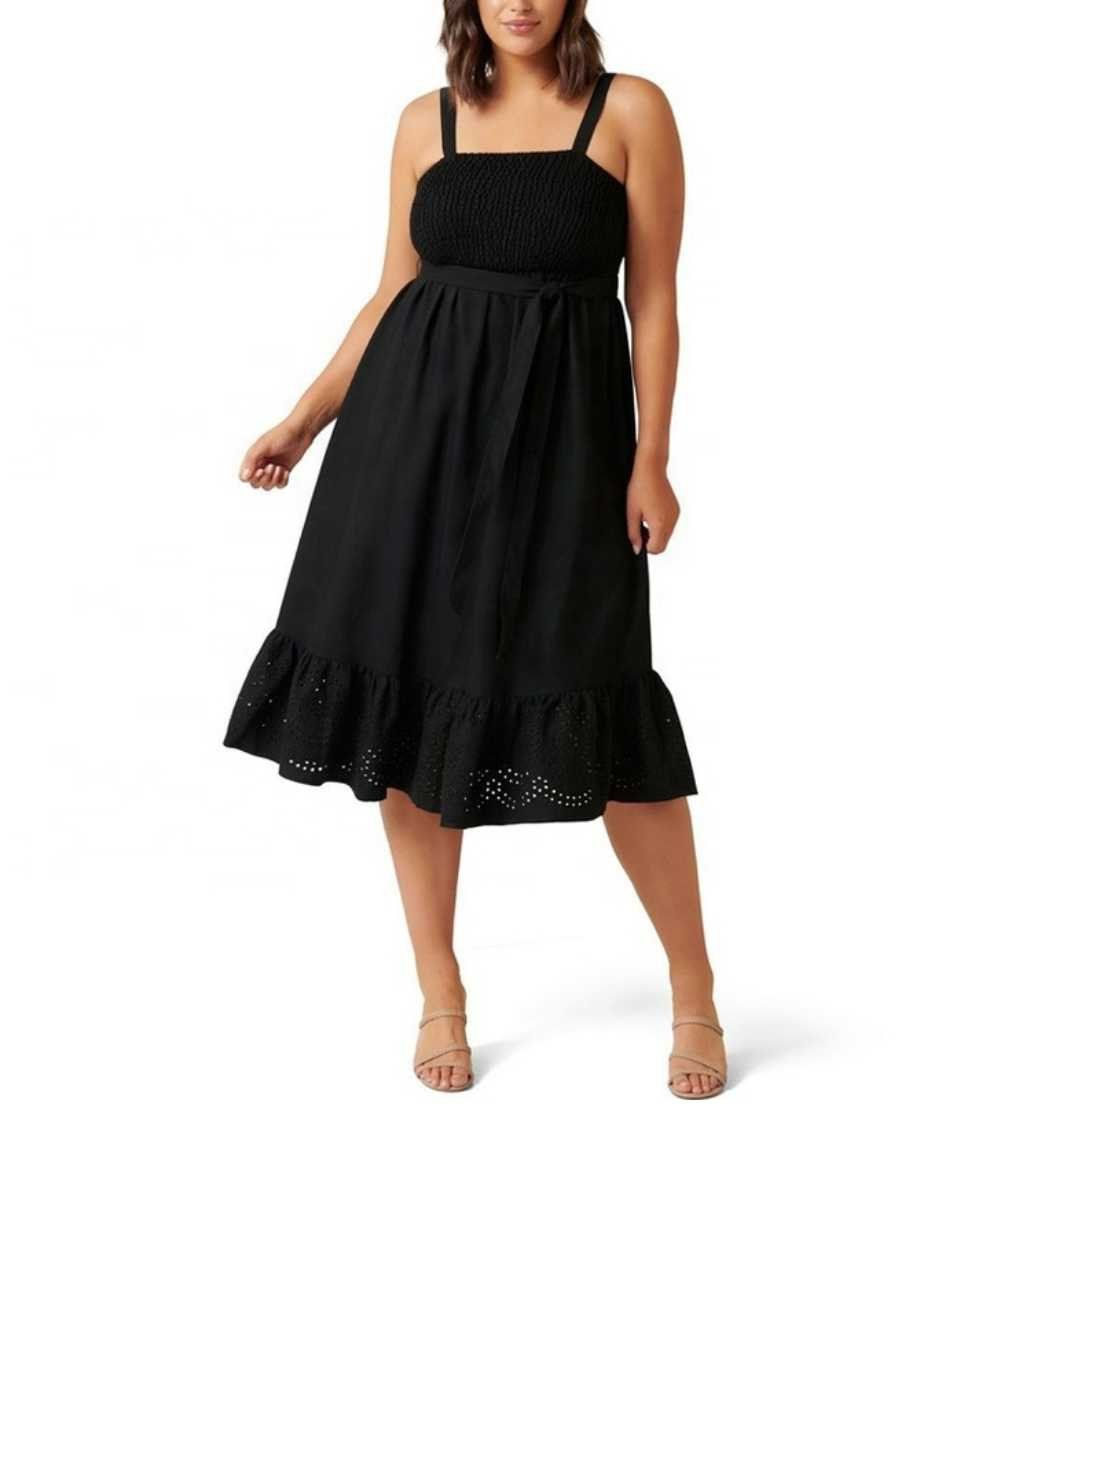 Plus Size Summer Maxi Dress